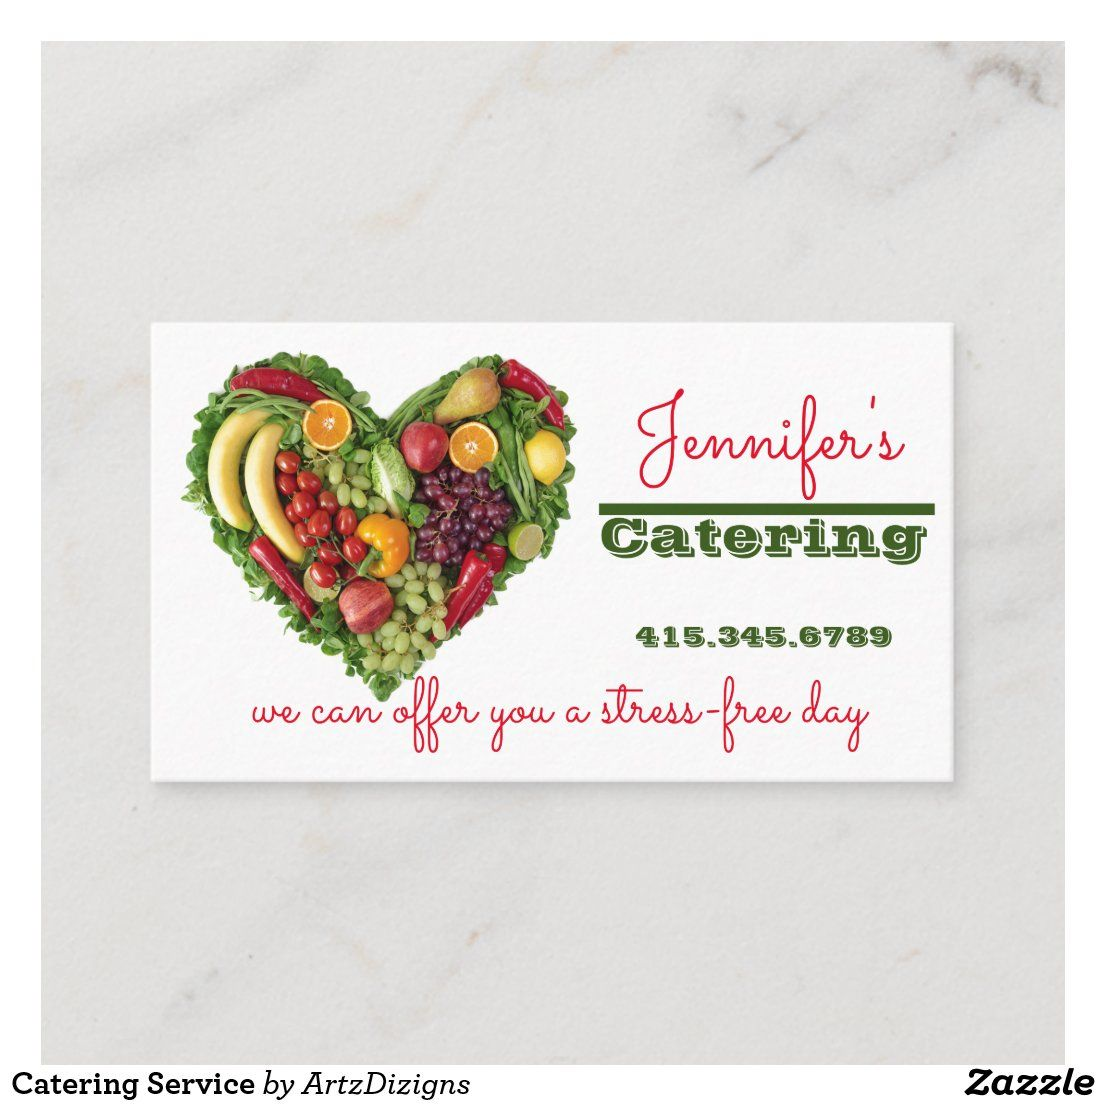 Catering Service Business Card   Zazzle.com